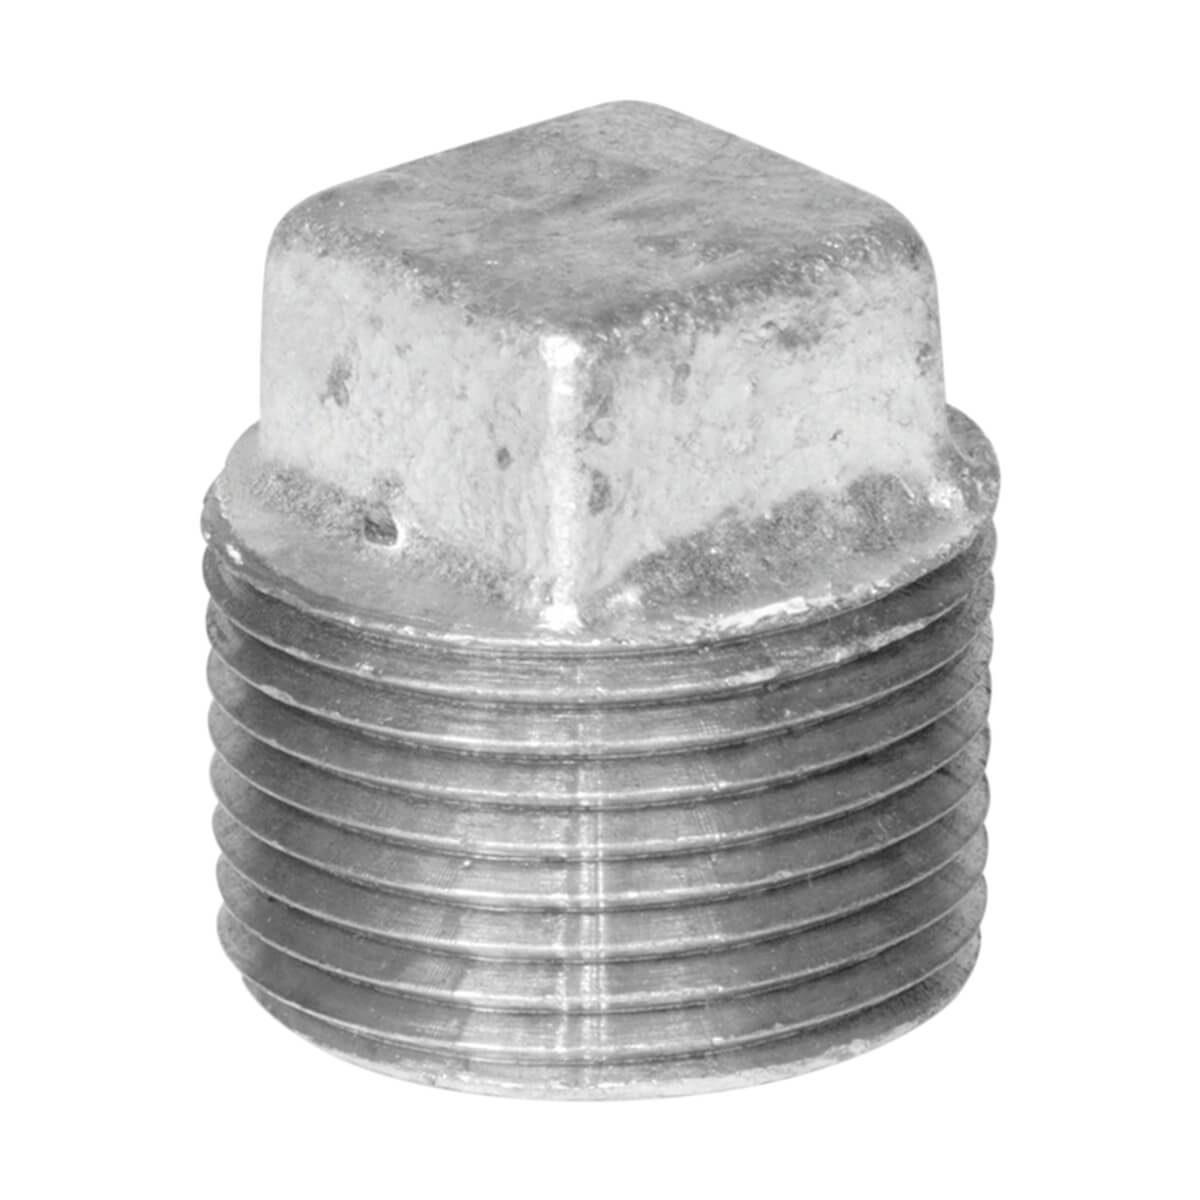 Fitting Galvanized Iron Plug - 1-1/2-in